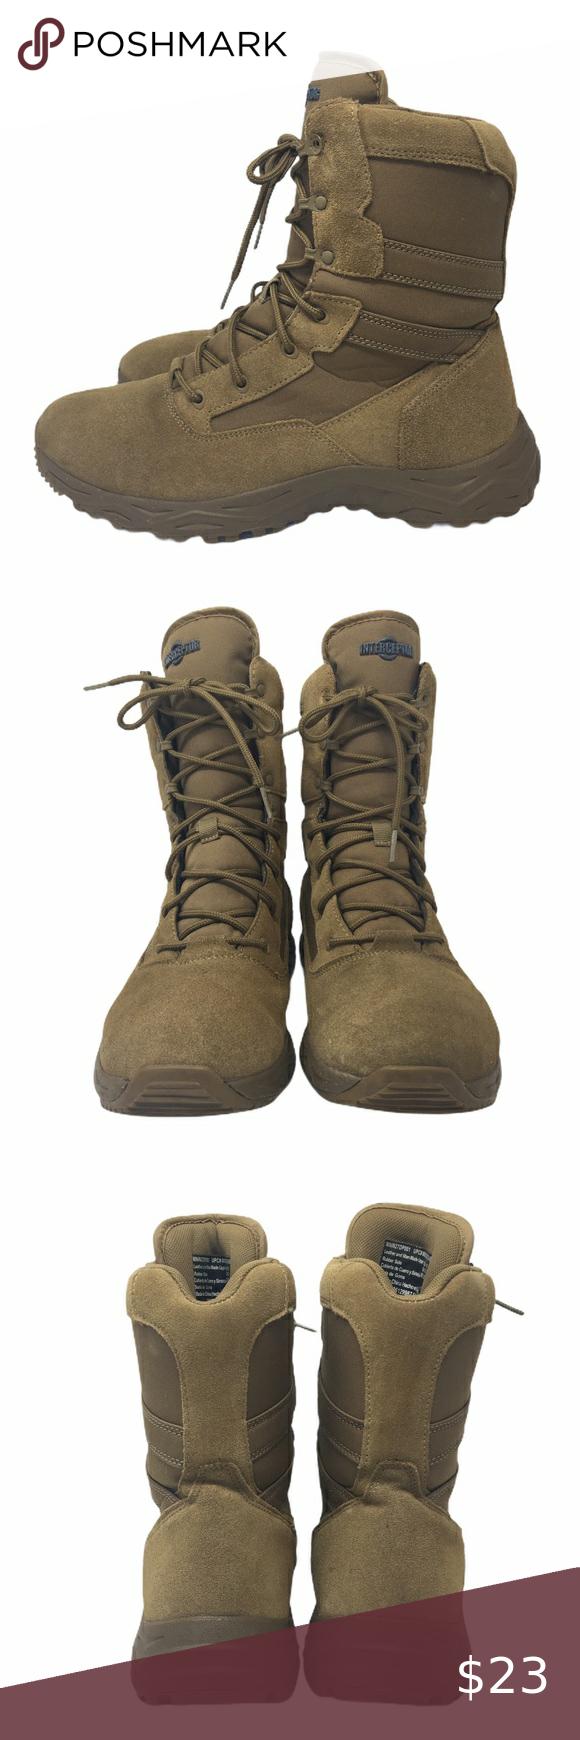 Men S Interceptor Coyote Brown Tall Boots Sz 10 0 In 2020 Boots Tall Brown Boots Tall Boots